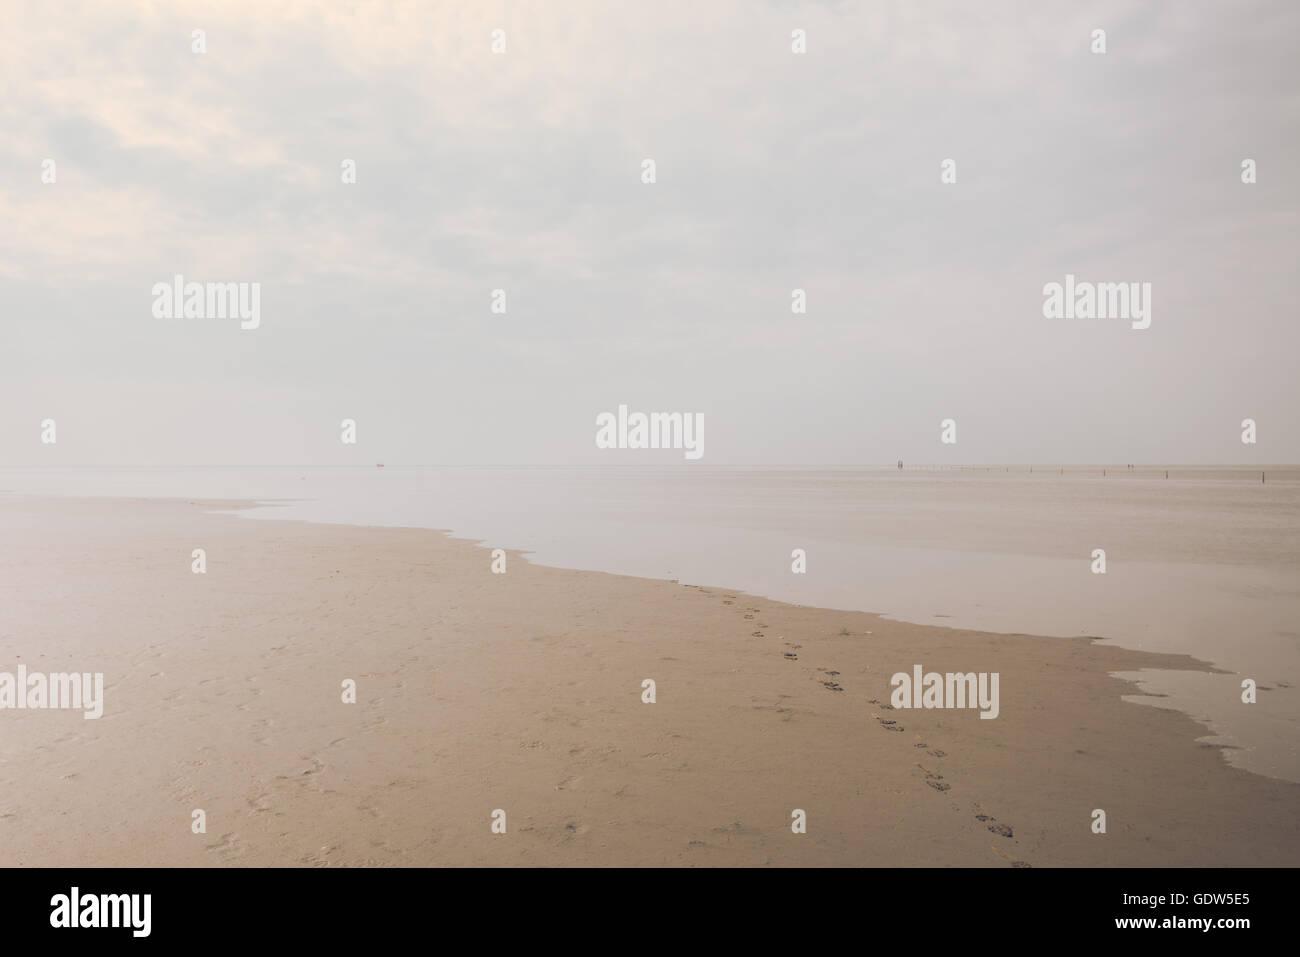 Minimal Seascapes - Stock Image